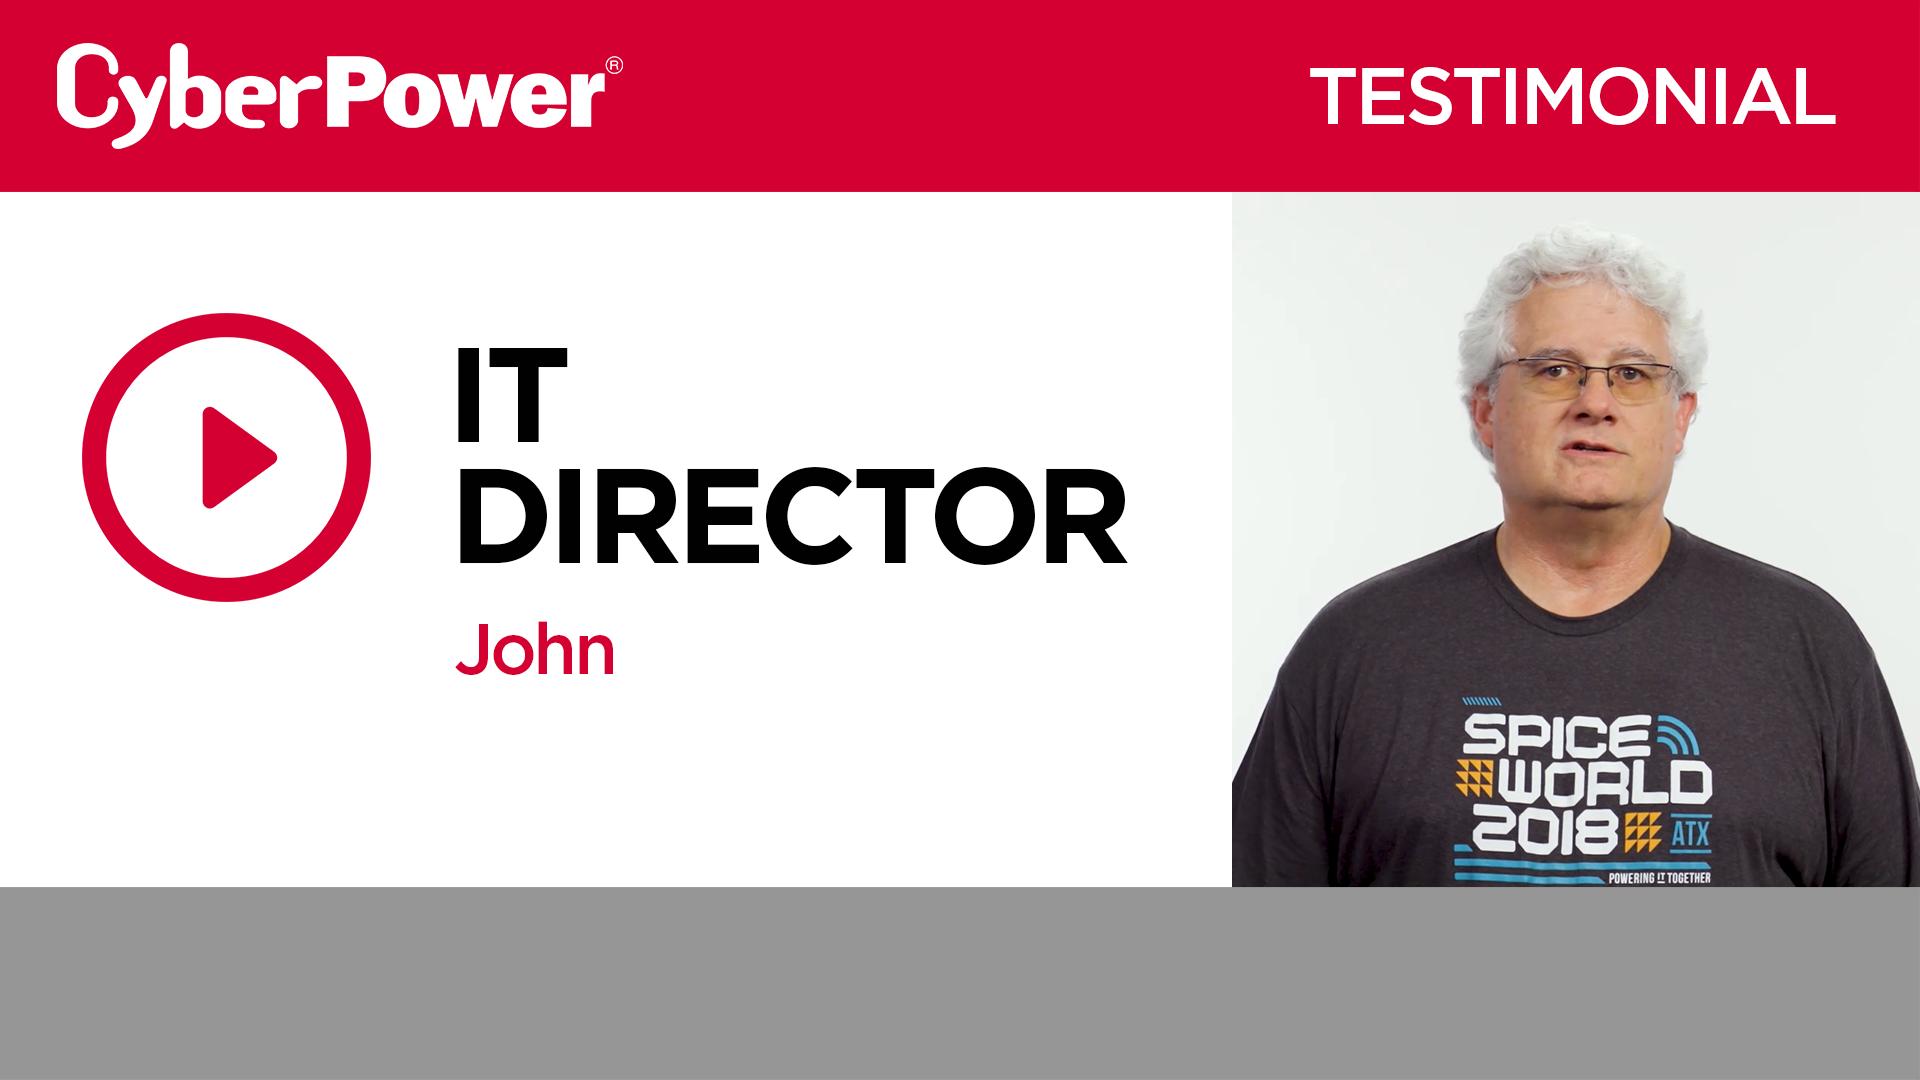 John IT Director Testimonial